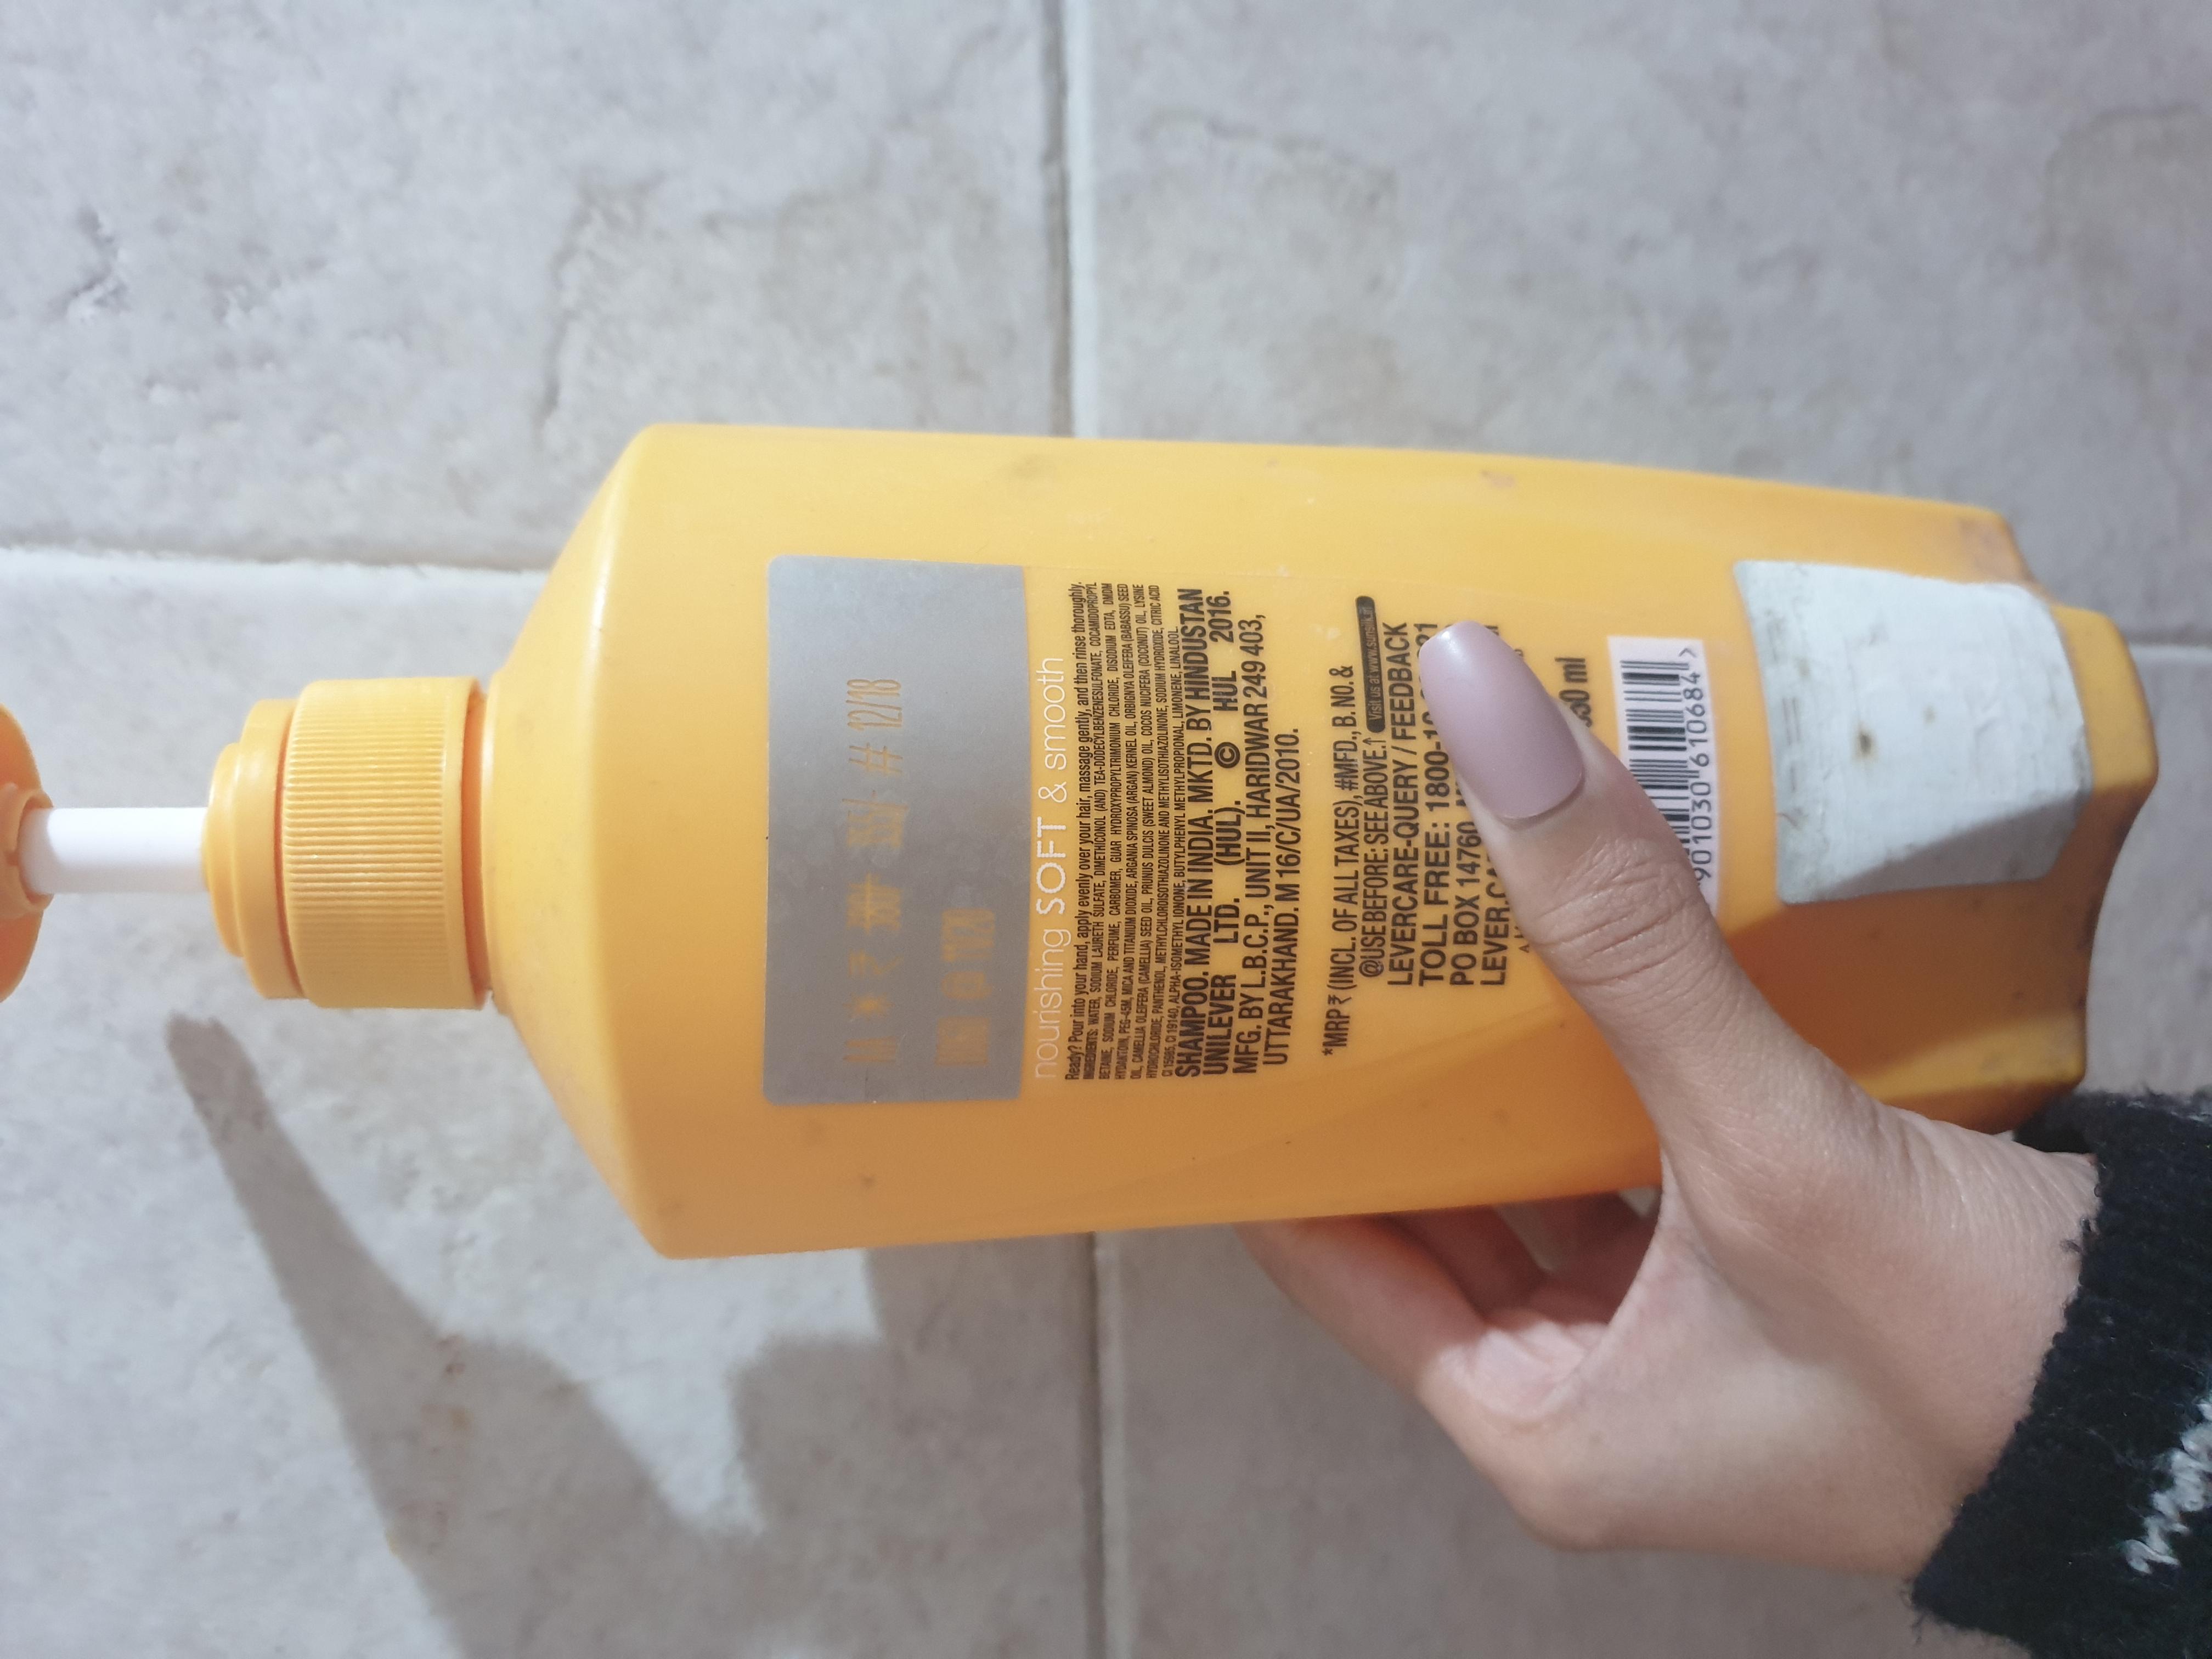 Sunsilk Nourishing Soft & Smooth Shampoo pic 1-Affordable shampoo-By vitika_singh